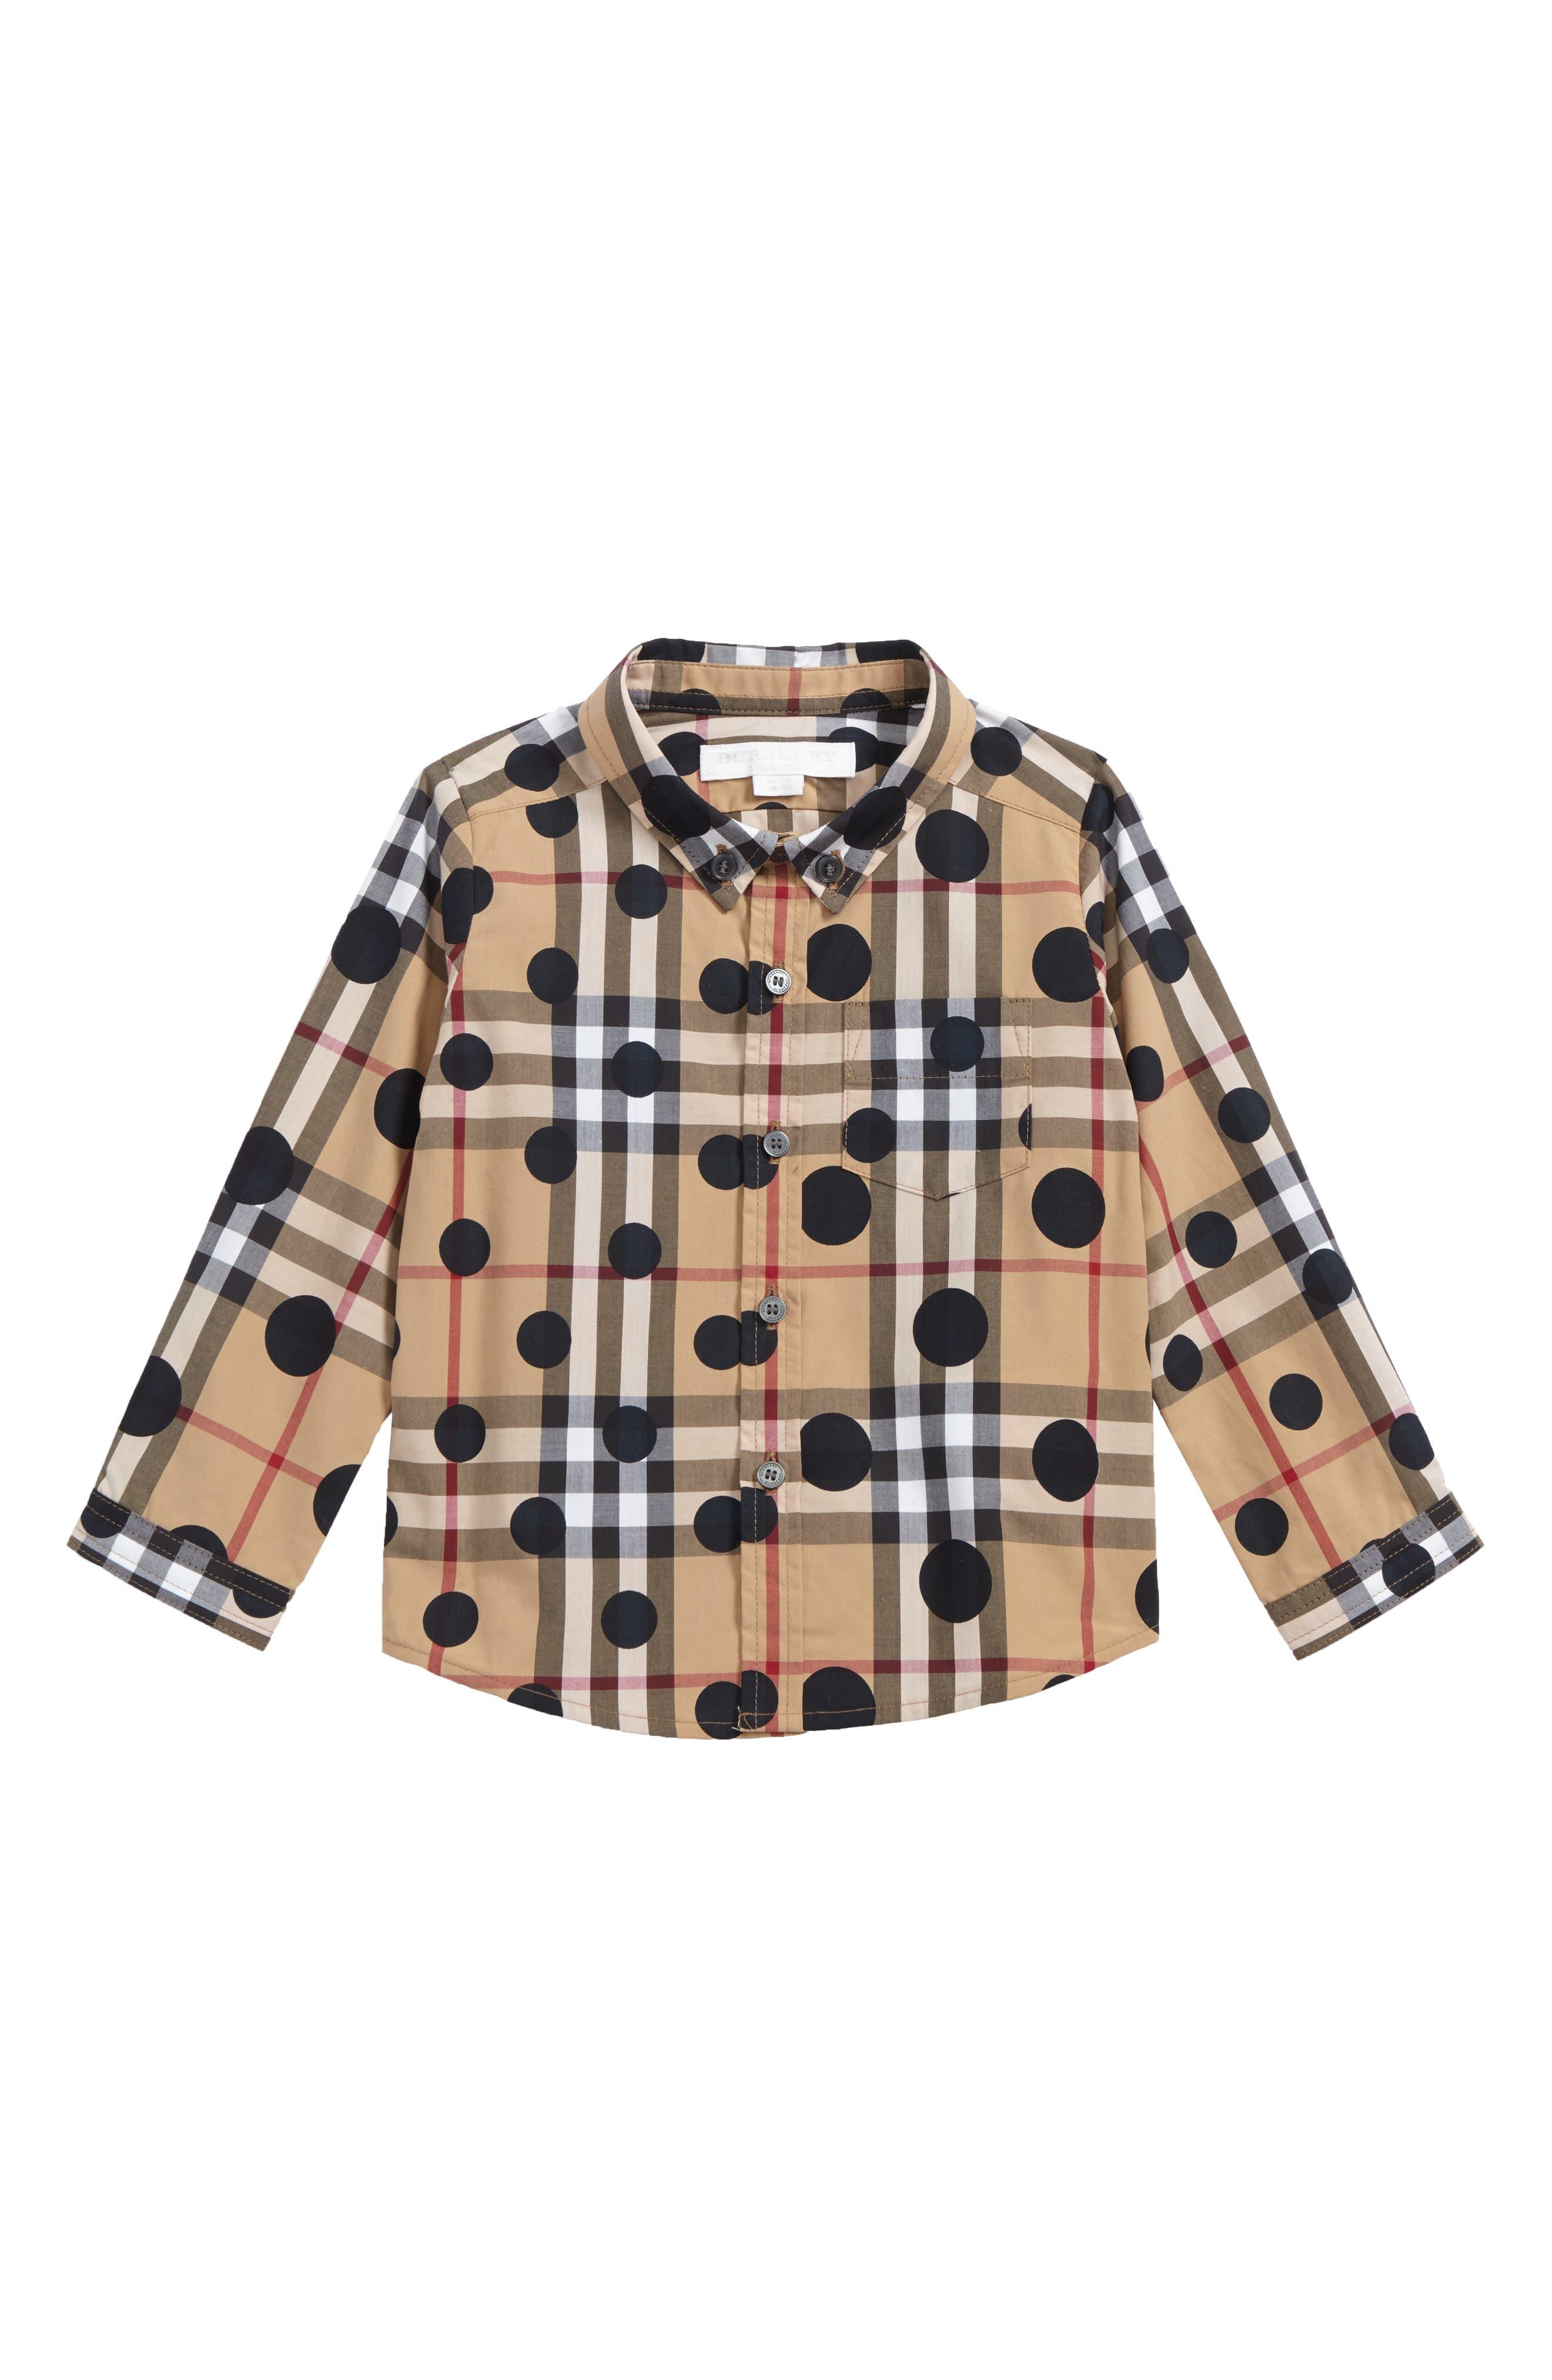 Main Image - Burberry Mini Fred Polka Dot & Check Print Shirt (Baby Boys)